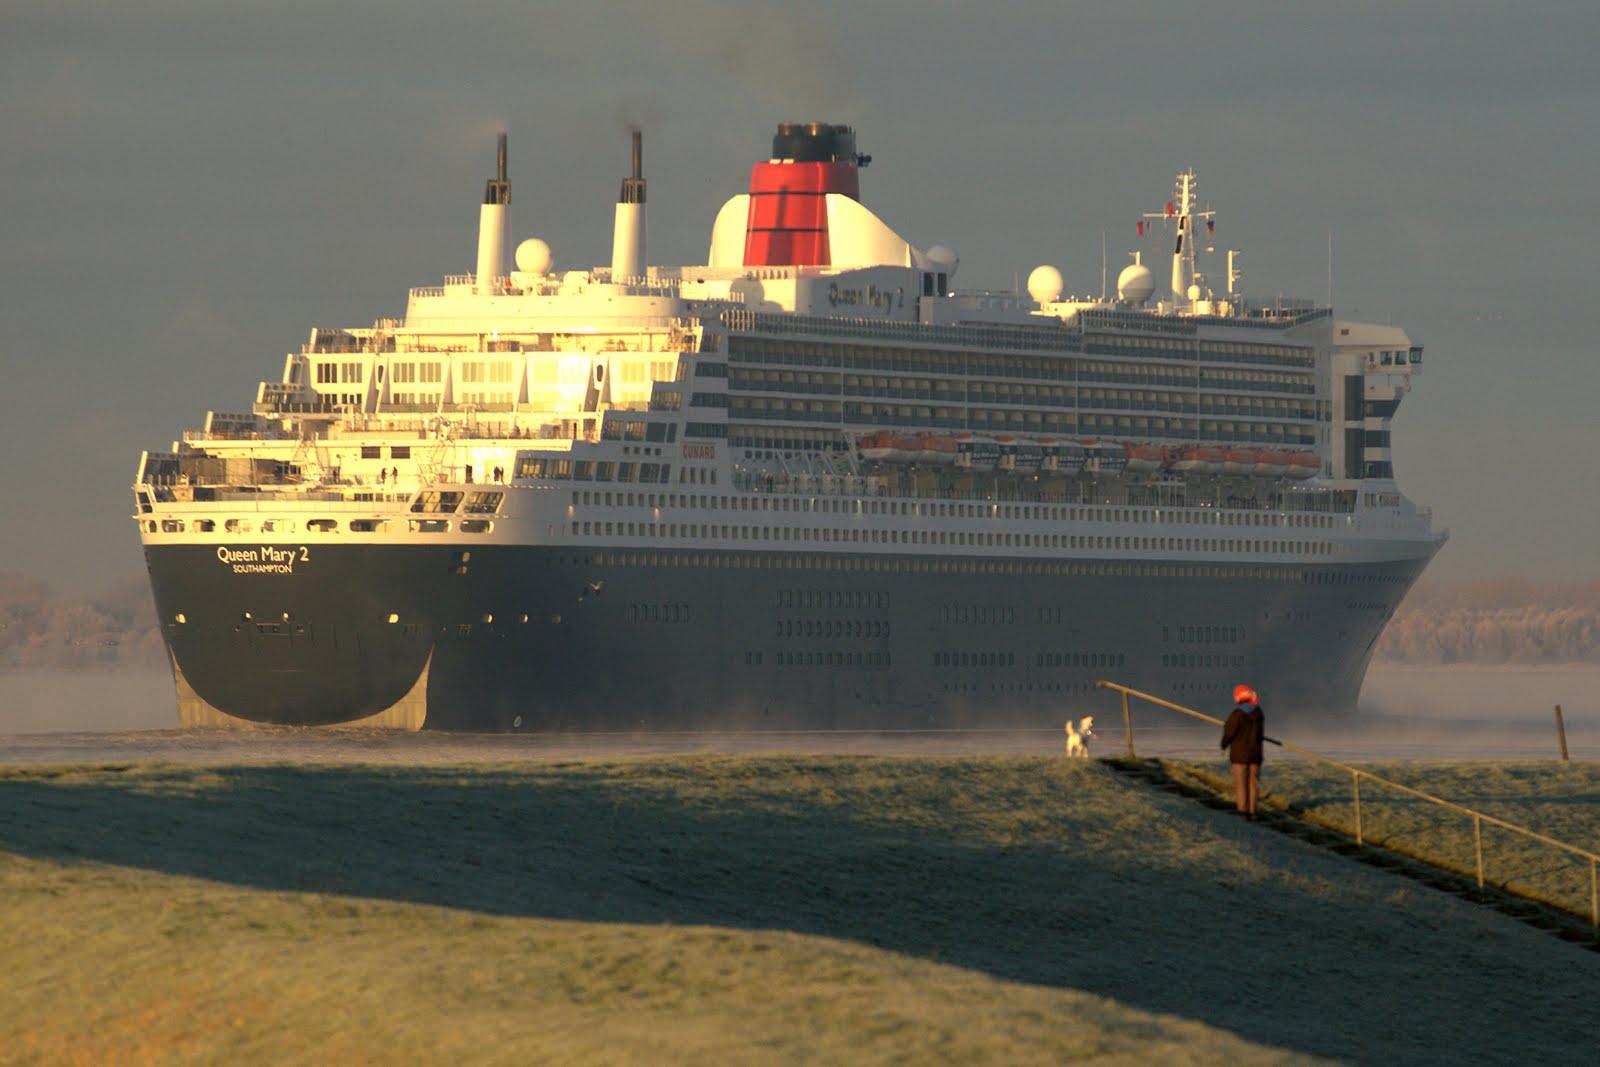 HAWSEPIPER: The Longest Climb: Bad bunker design: cruise ships